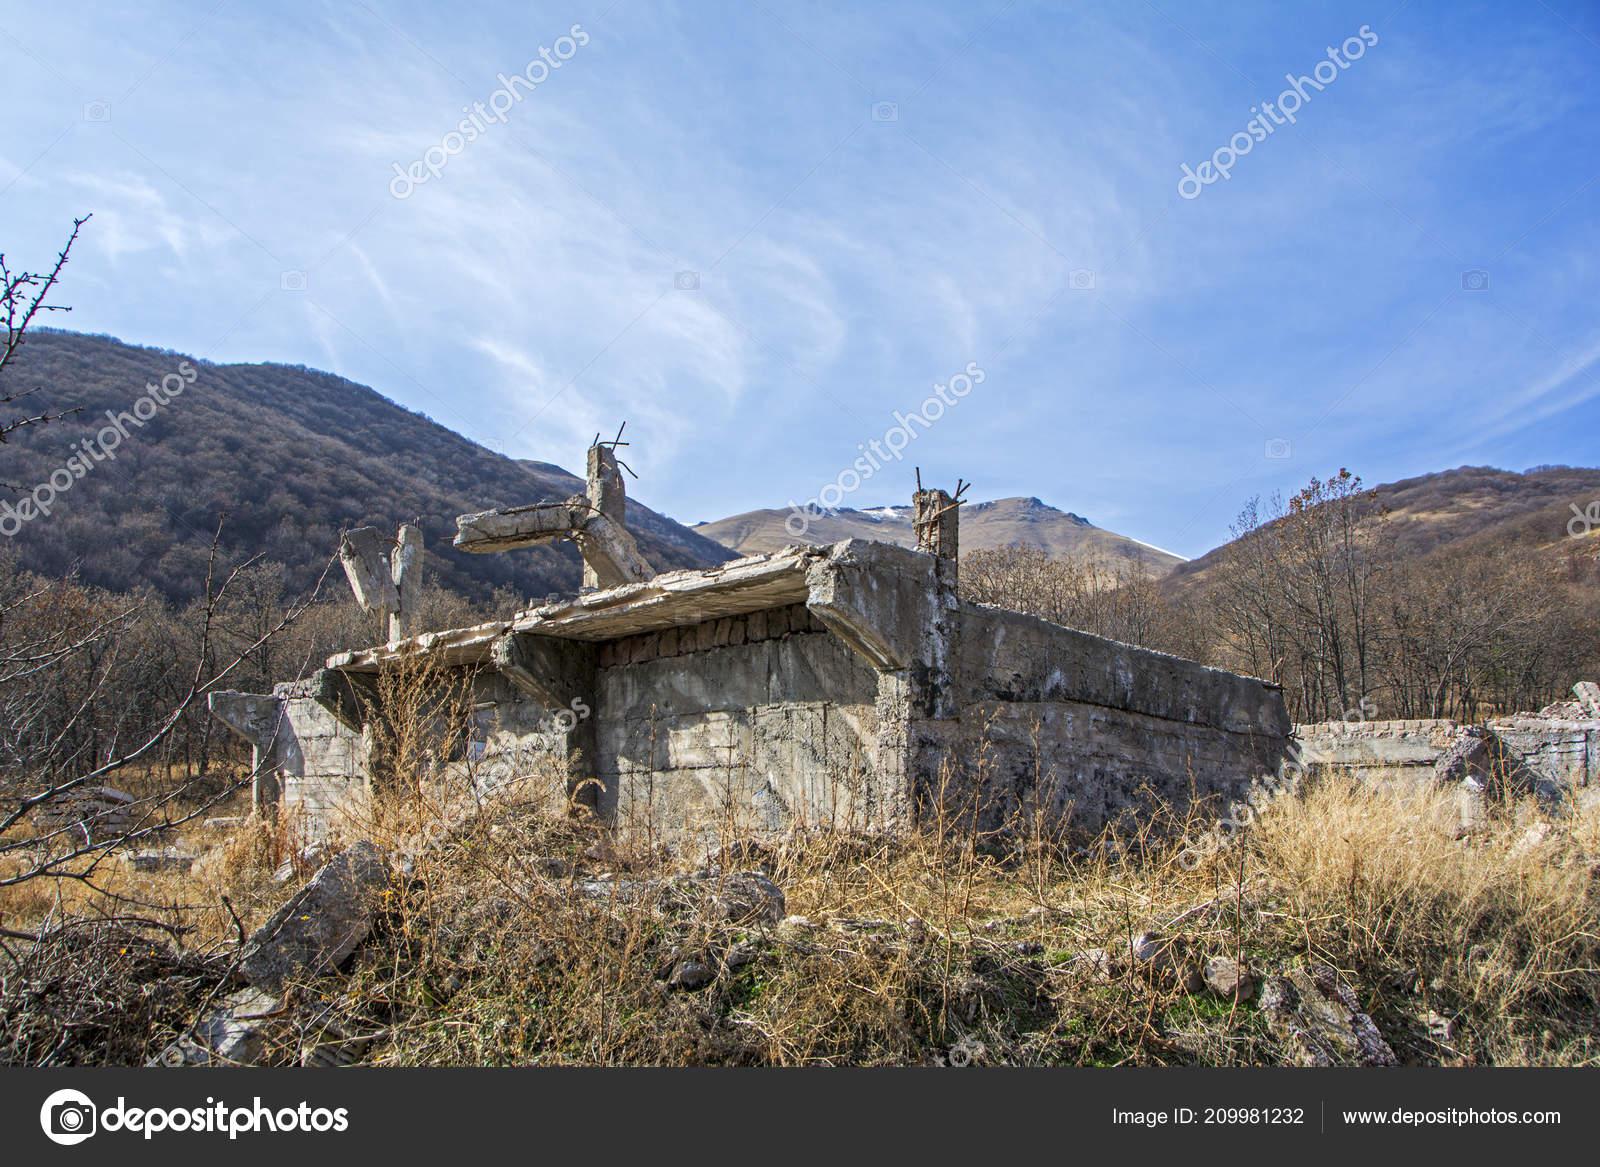 apocalyptic landscape destroyed building wasteland mountains